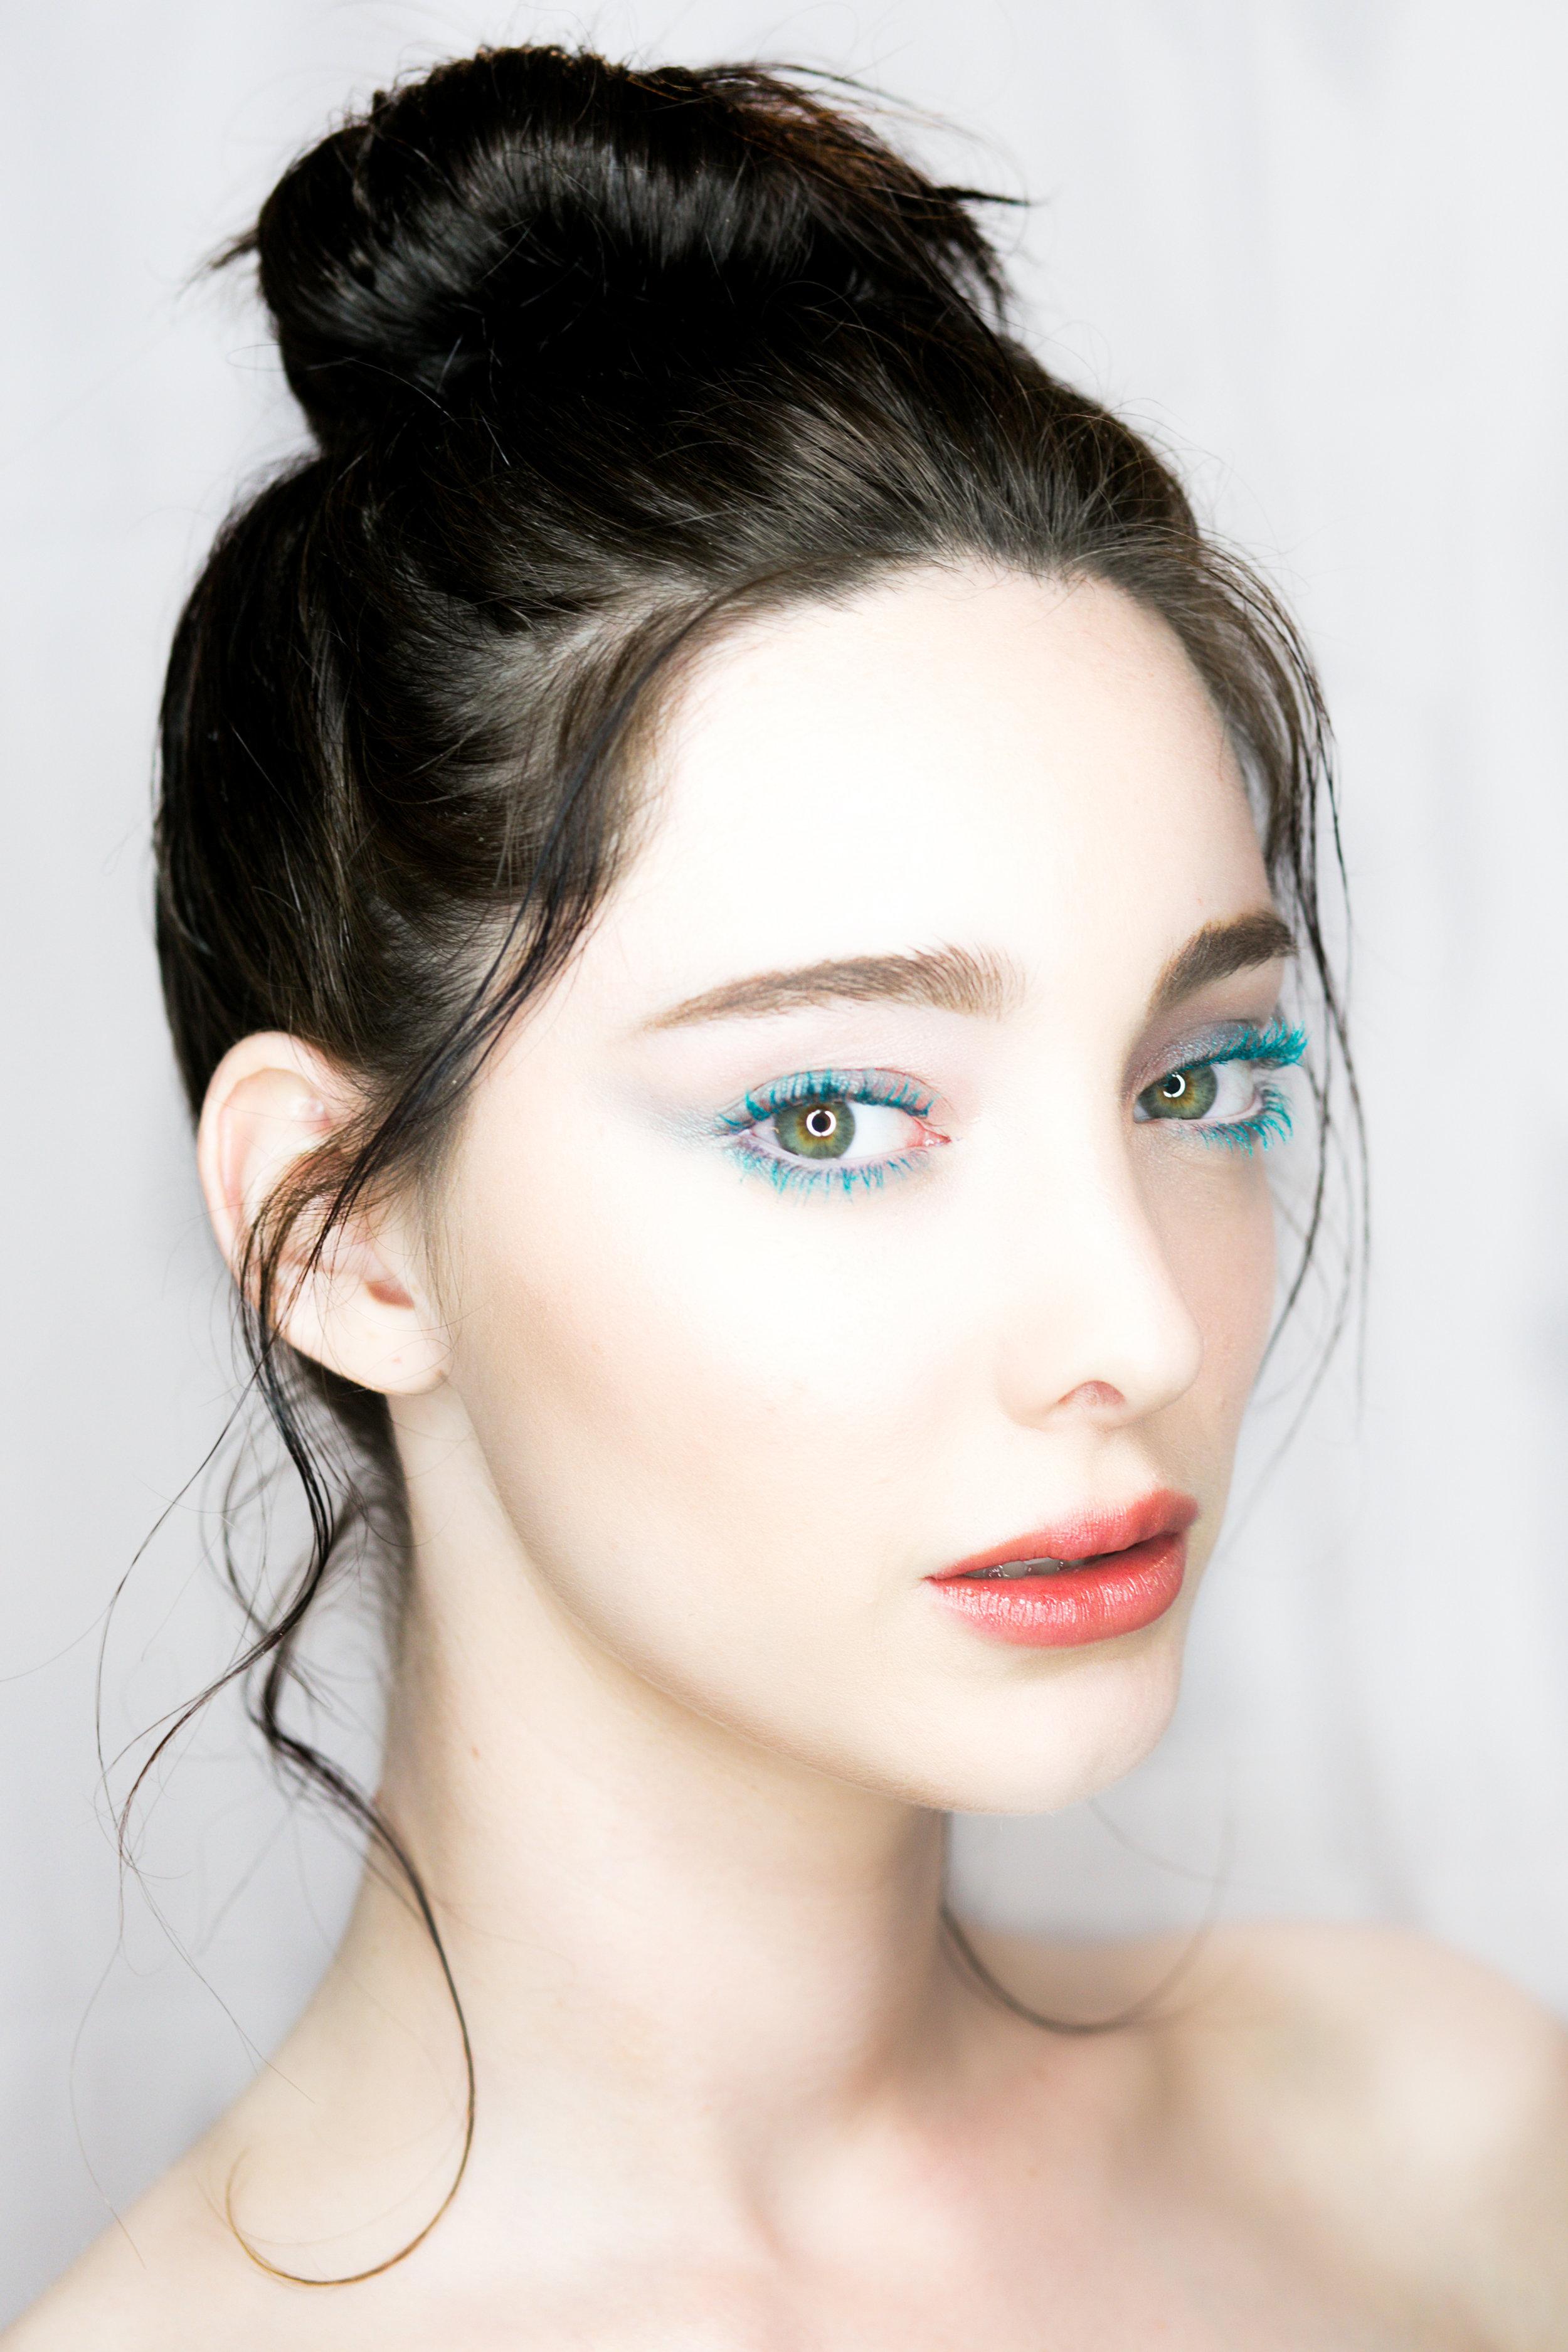 Emma-Blue-30 copy.jpg